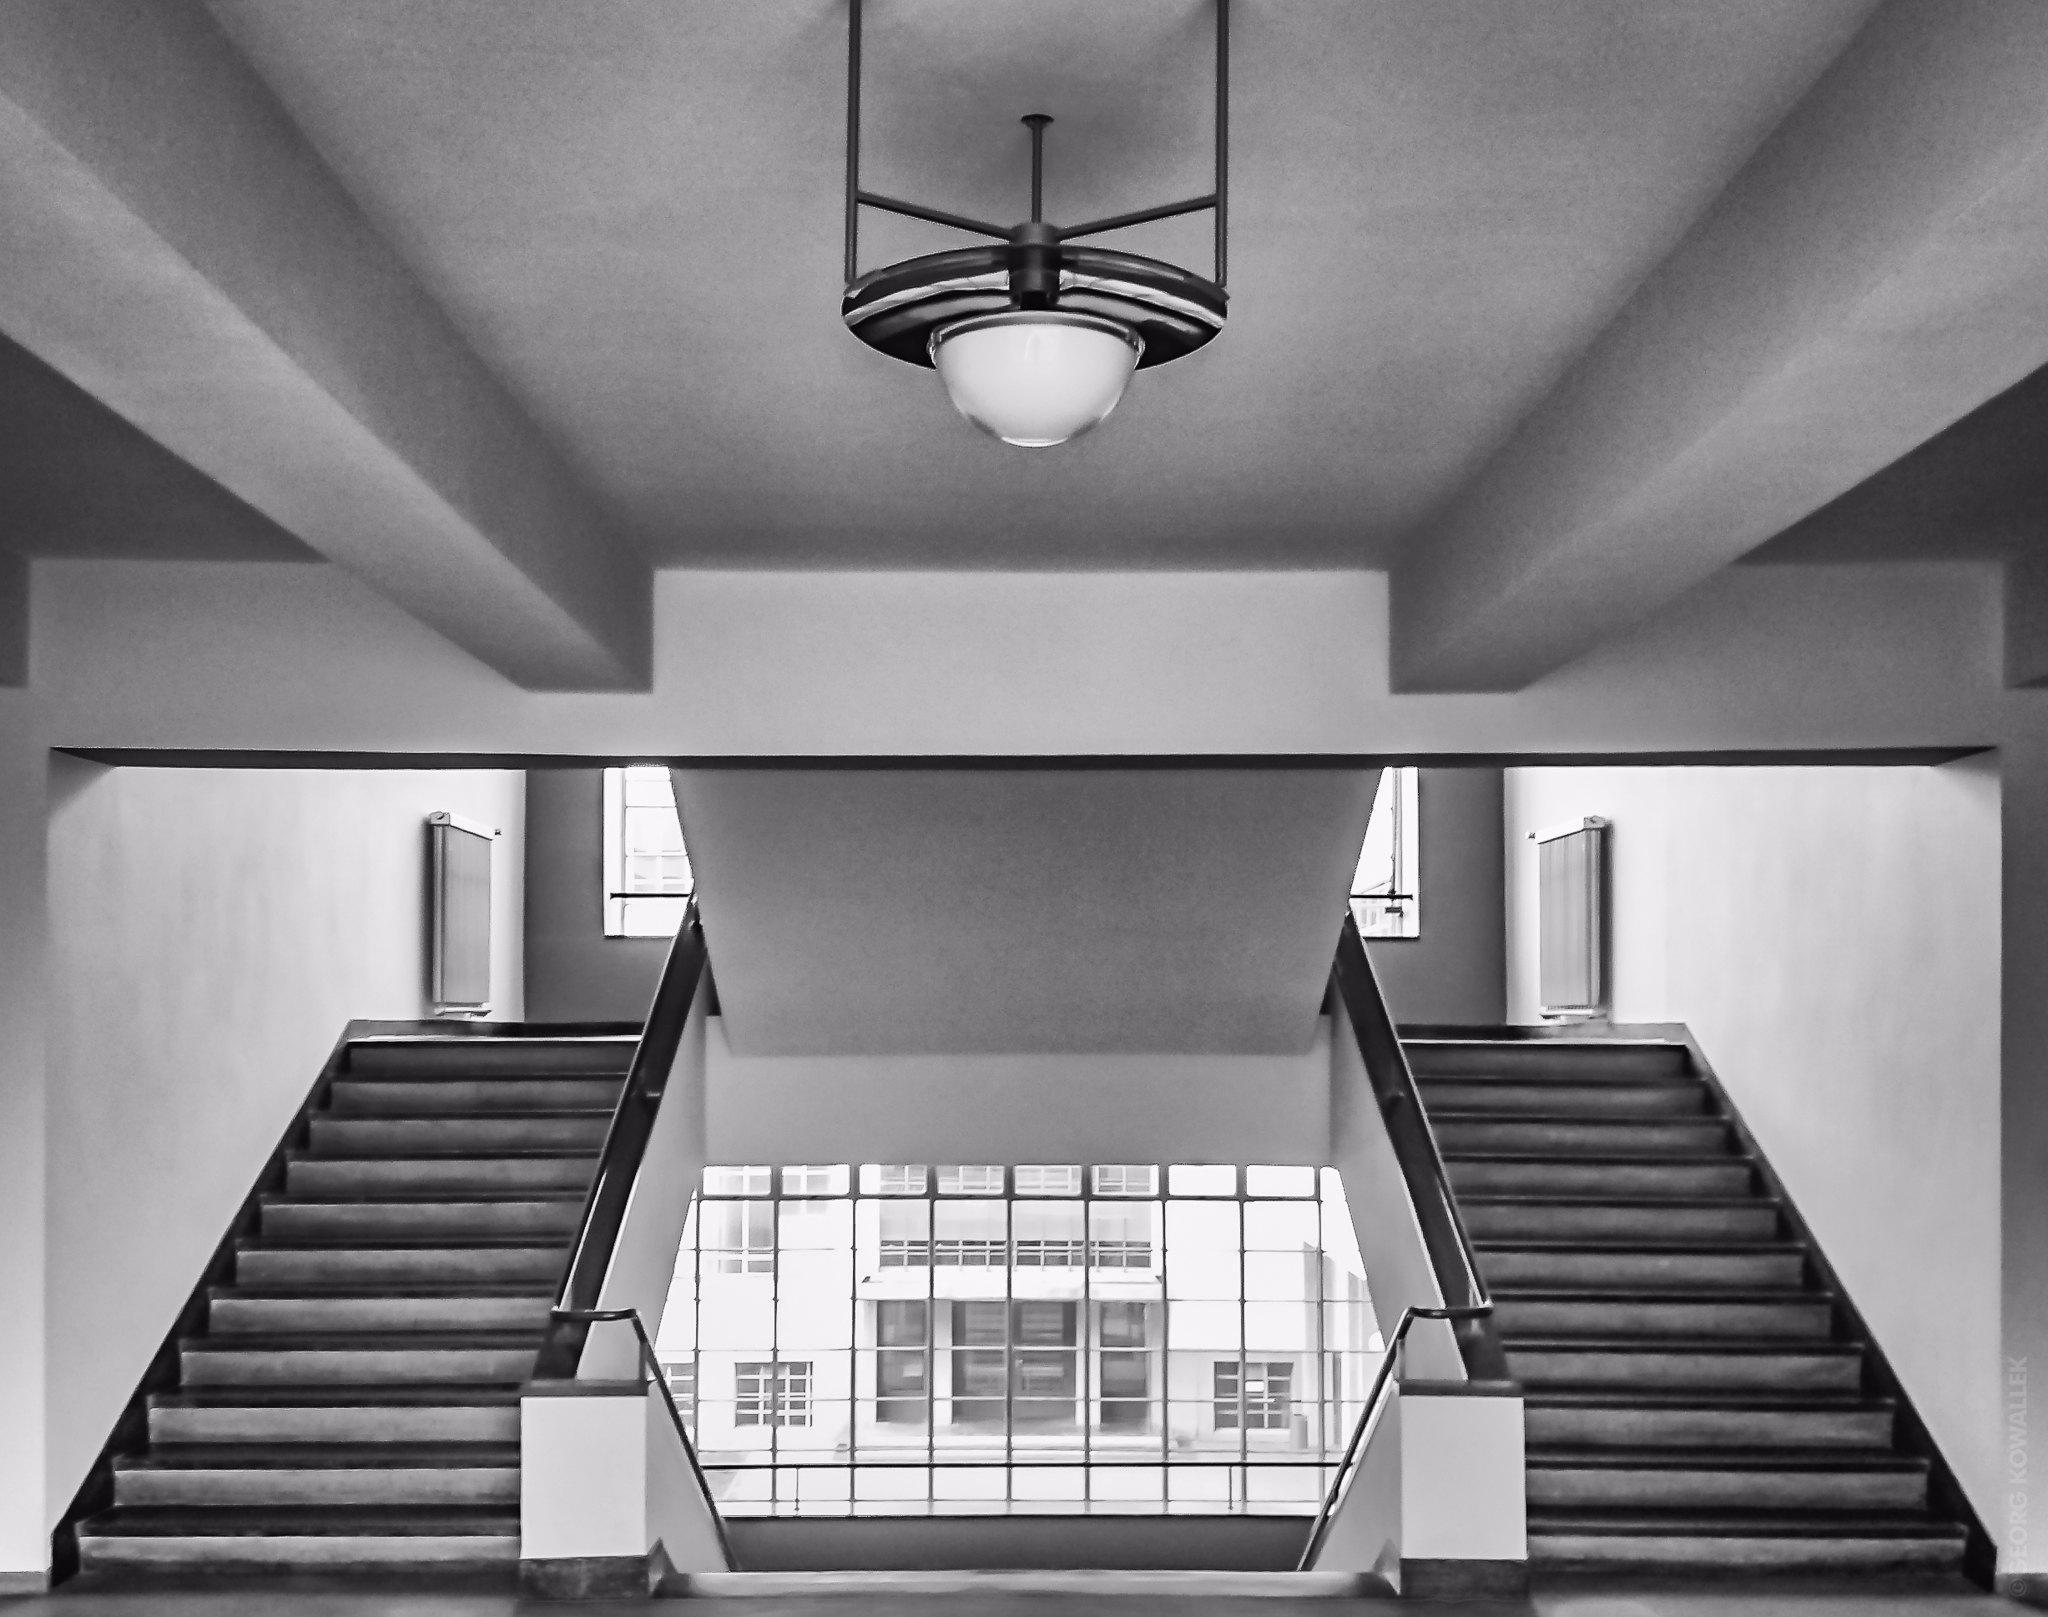 Dessau, home Bauhaus Museum  - bauhaus - gkowallek | ello